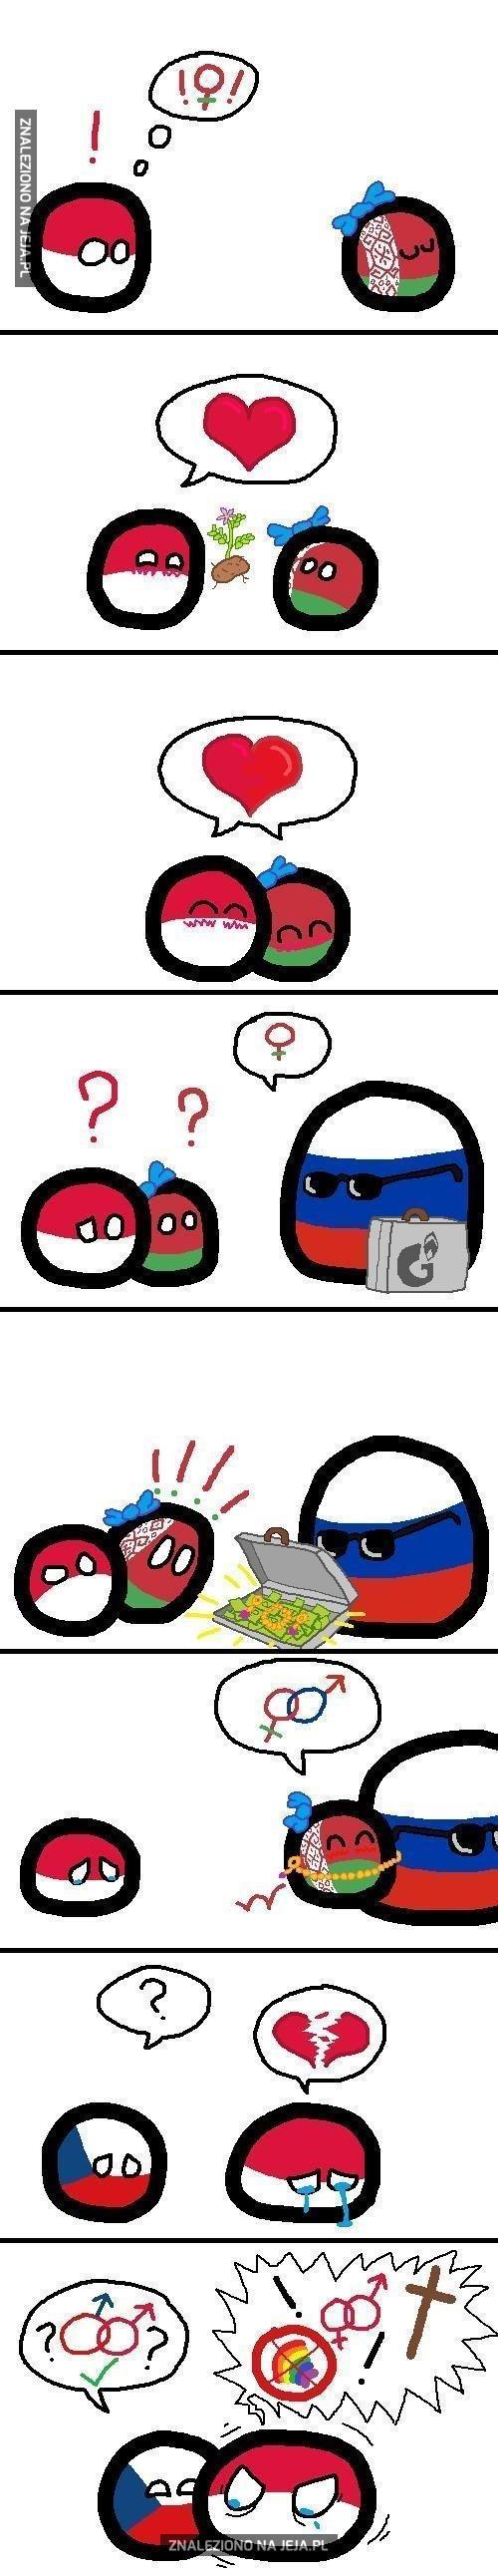 Na bezrybiu i Czechy ryba